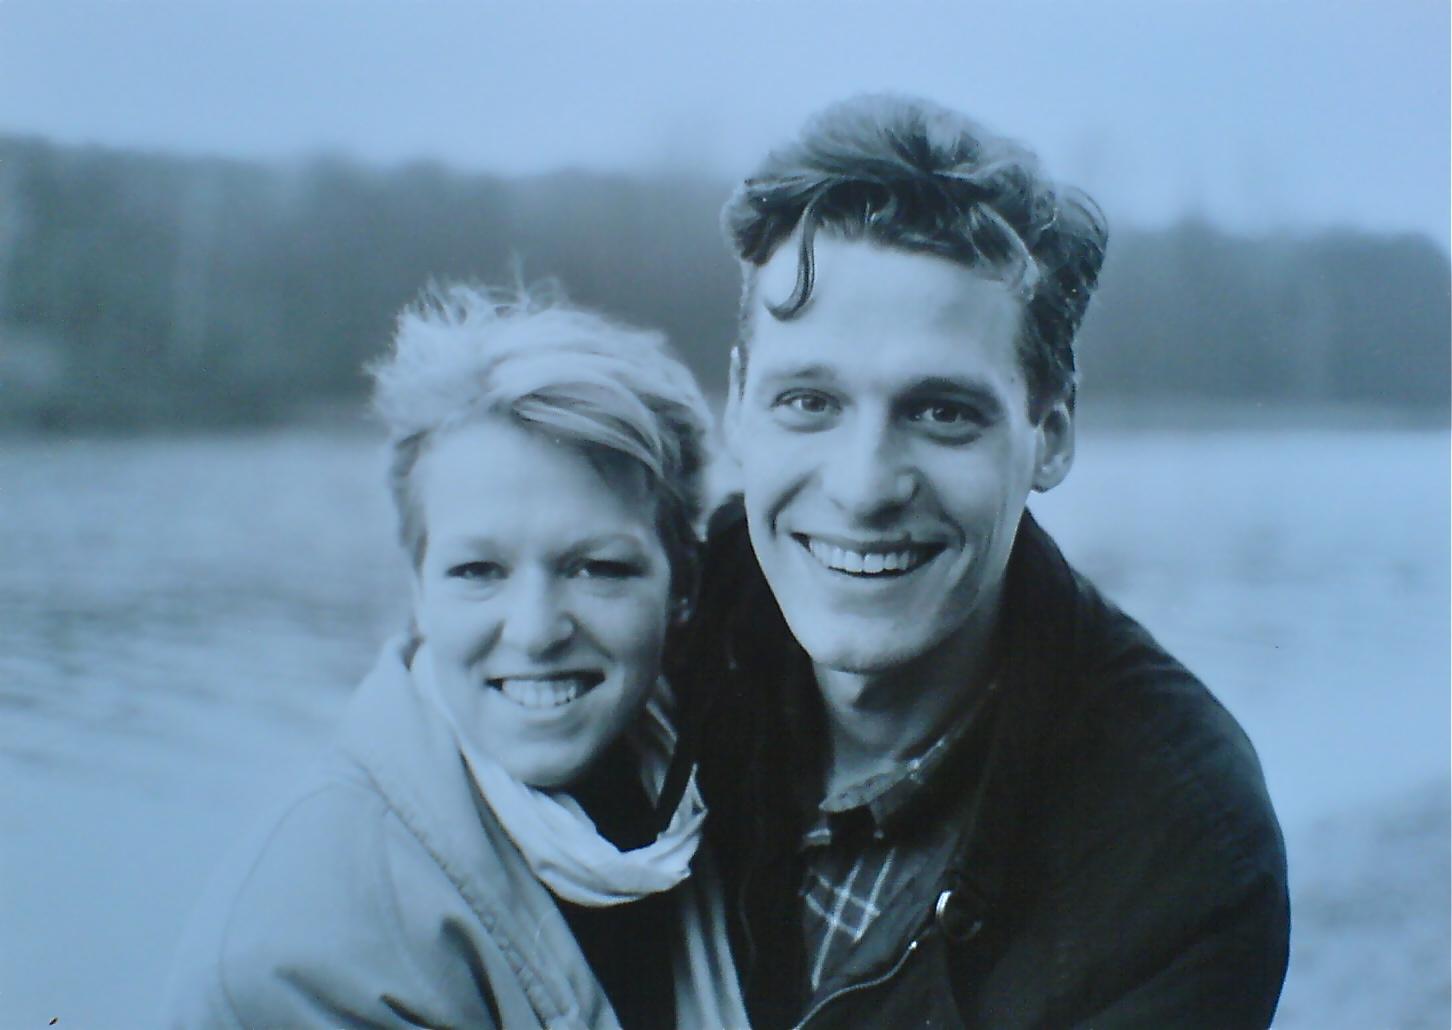 Ben & Angela